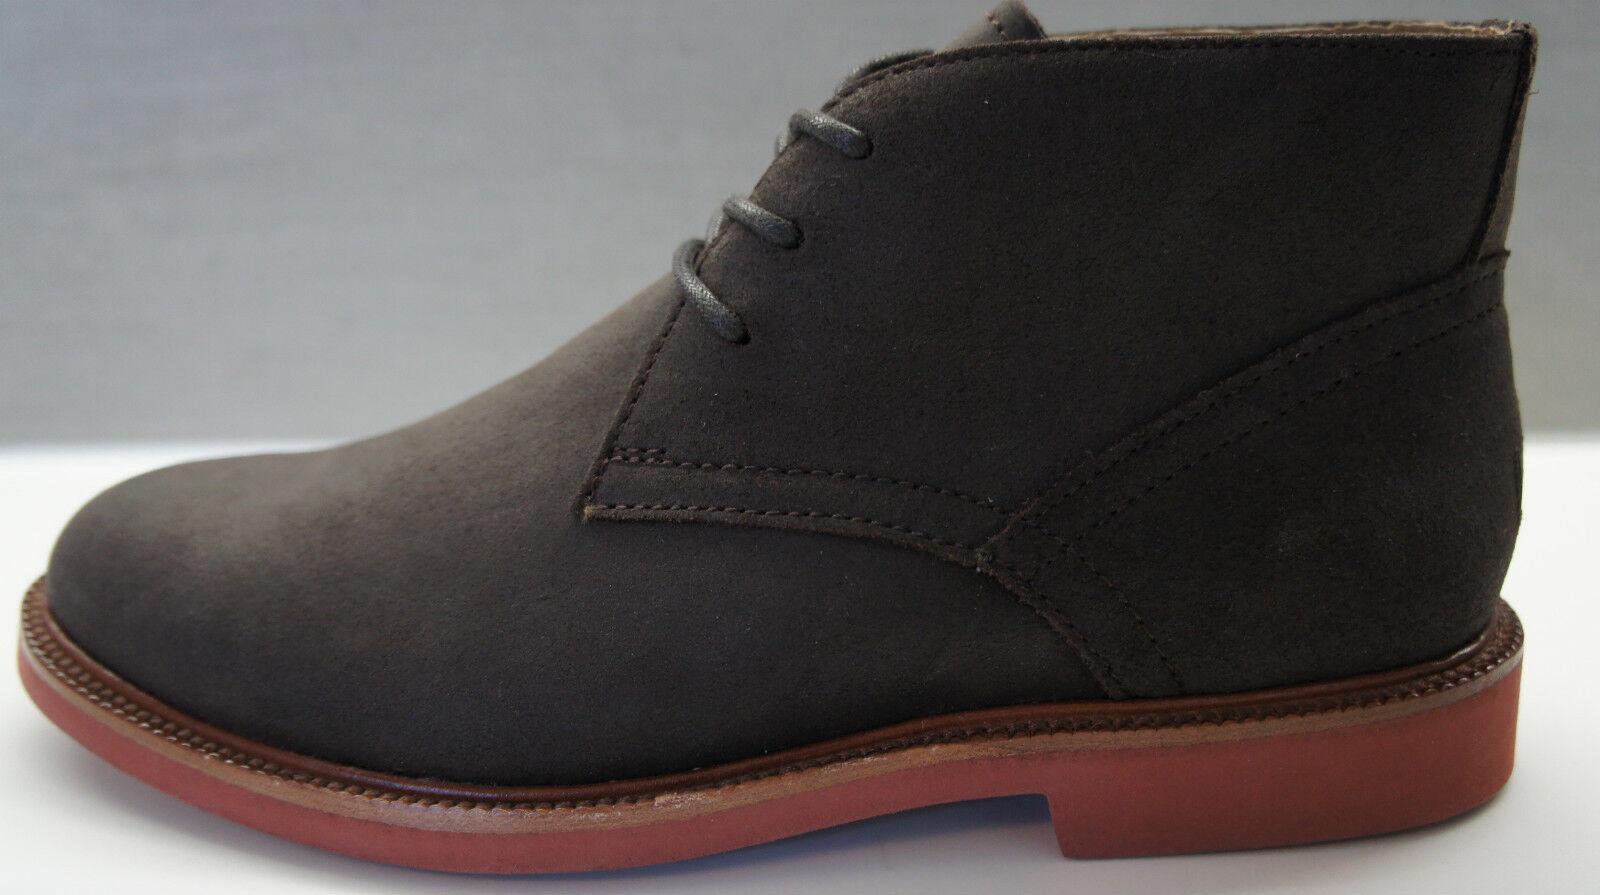 POLO RALPH LAUREN MENs TORRINGTON CHUKKA Stiefel DARK BROWN BROWN BROWN UK 6.5   7   7.5 b8a881